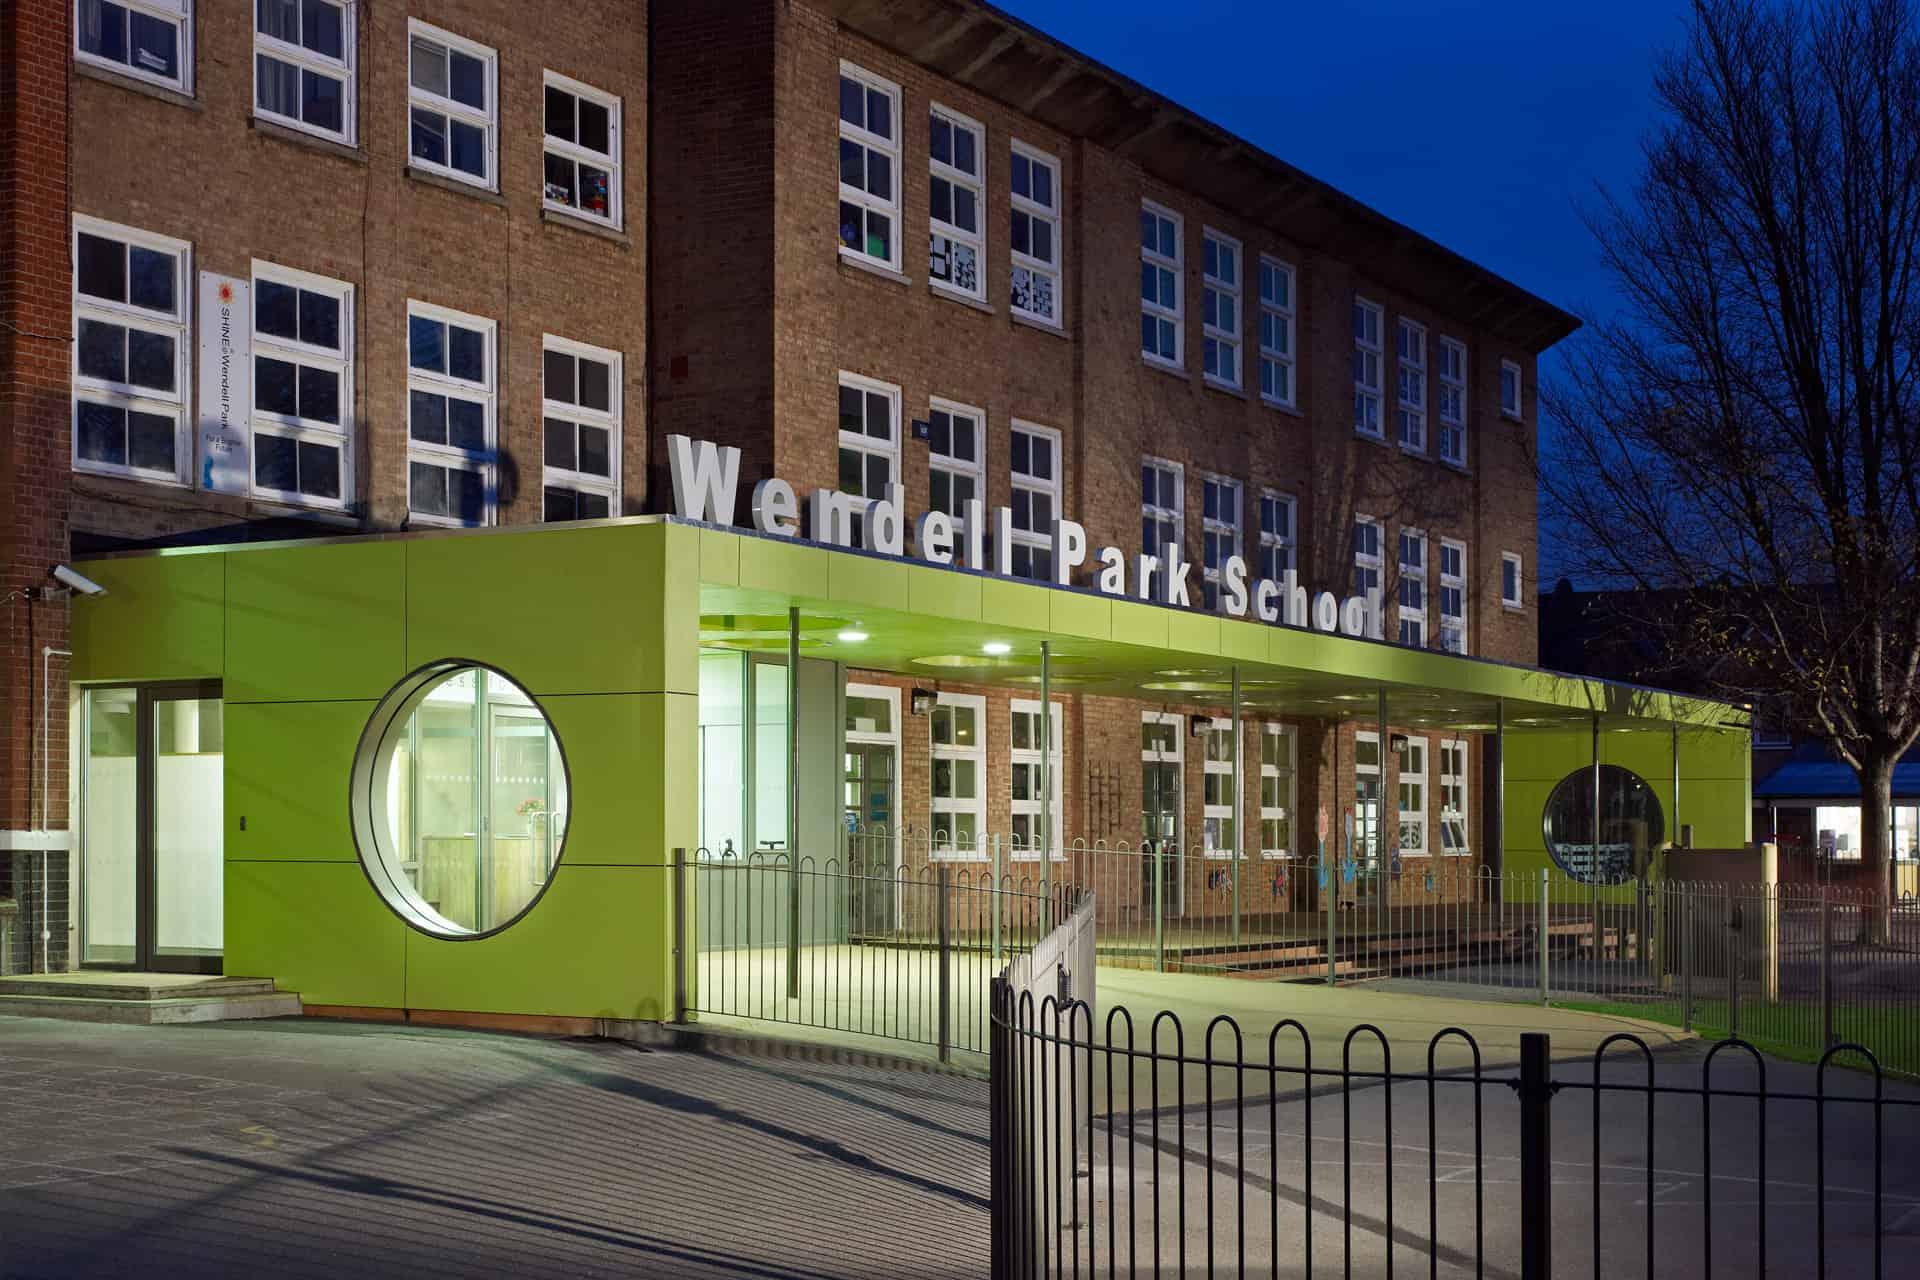 MNP Wendell Park Primary School